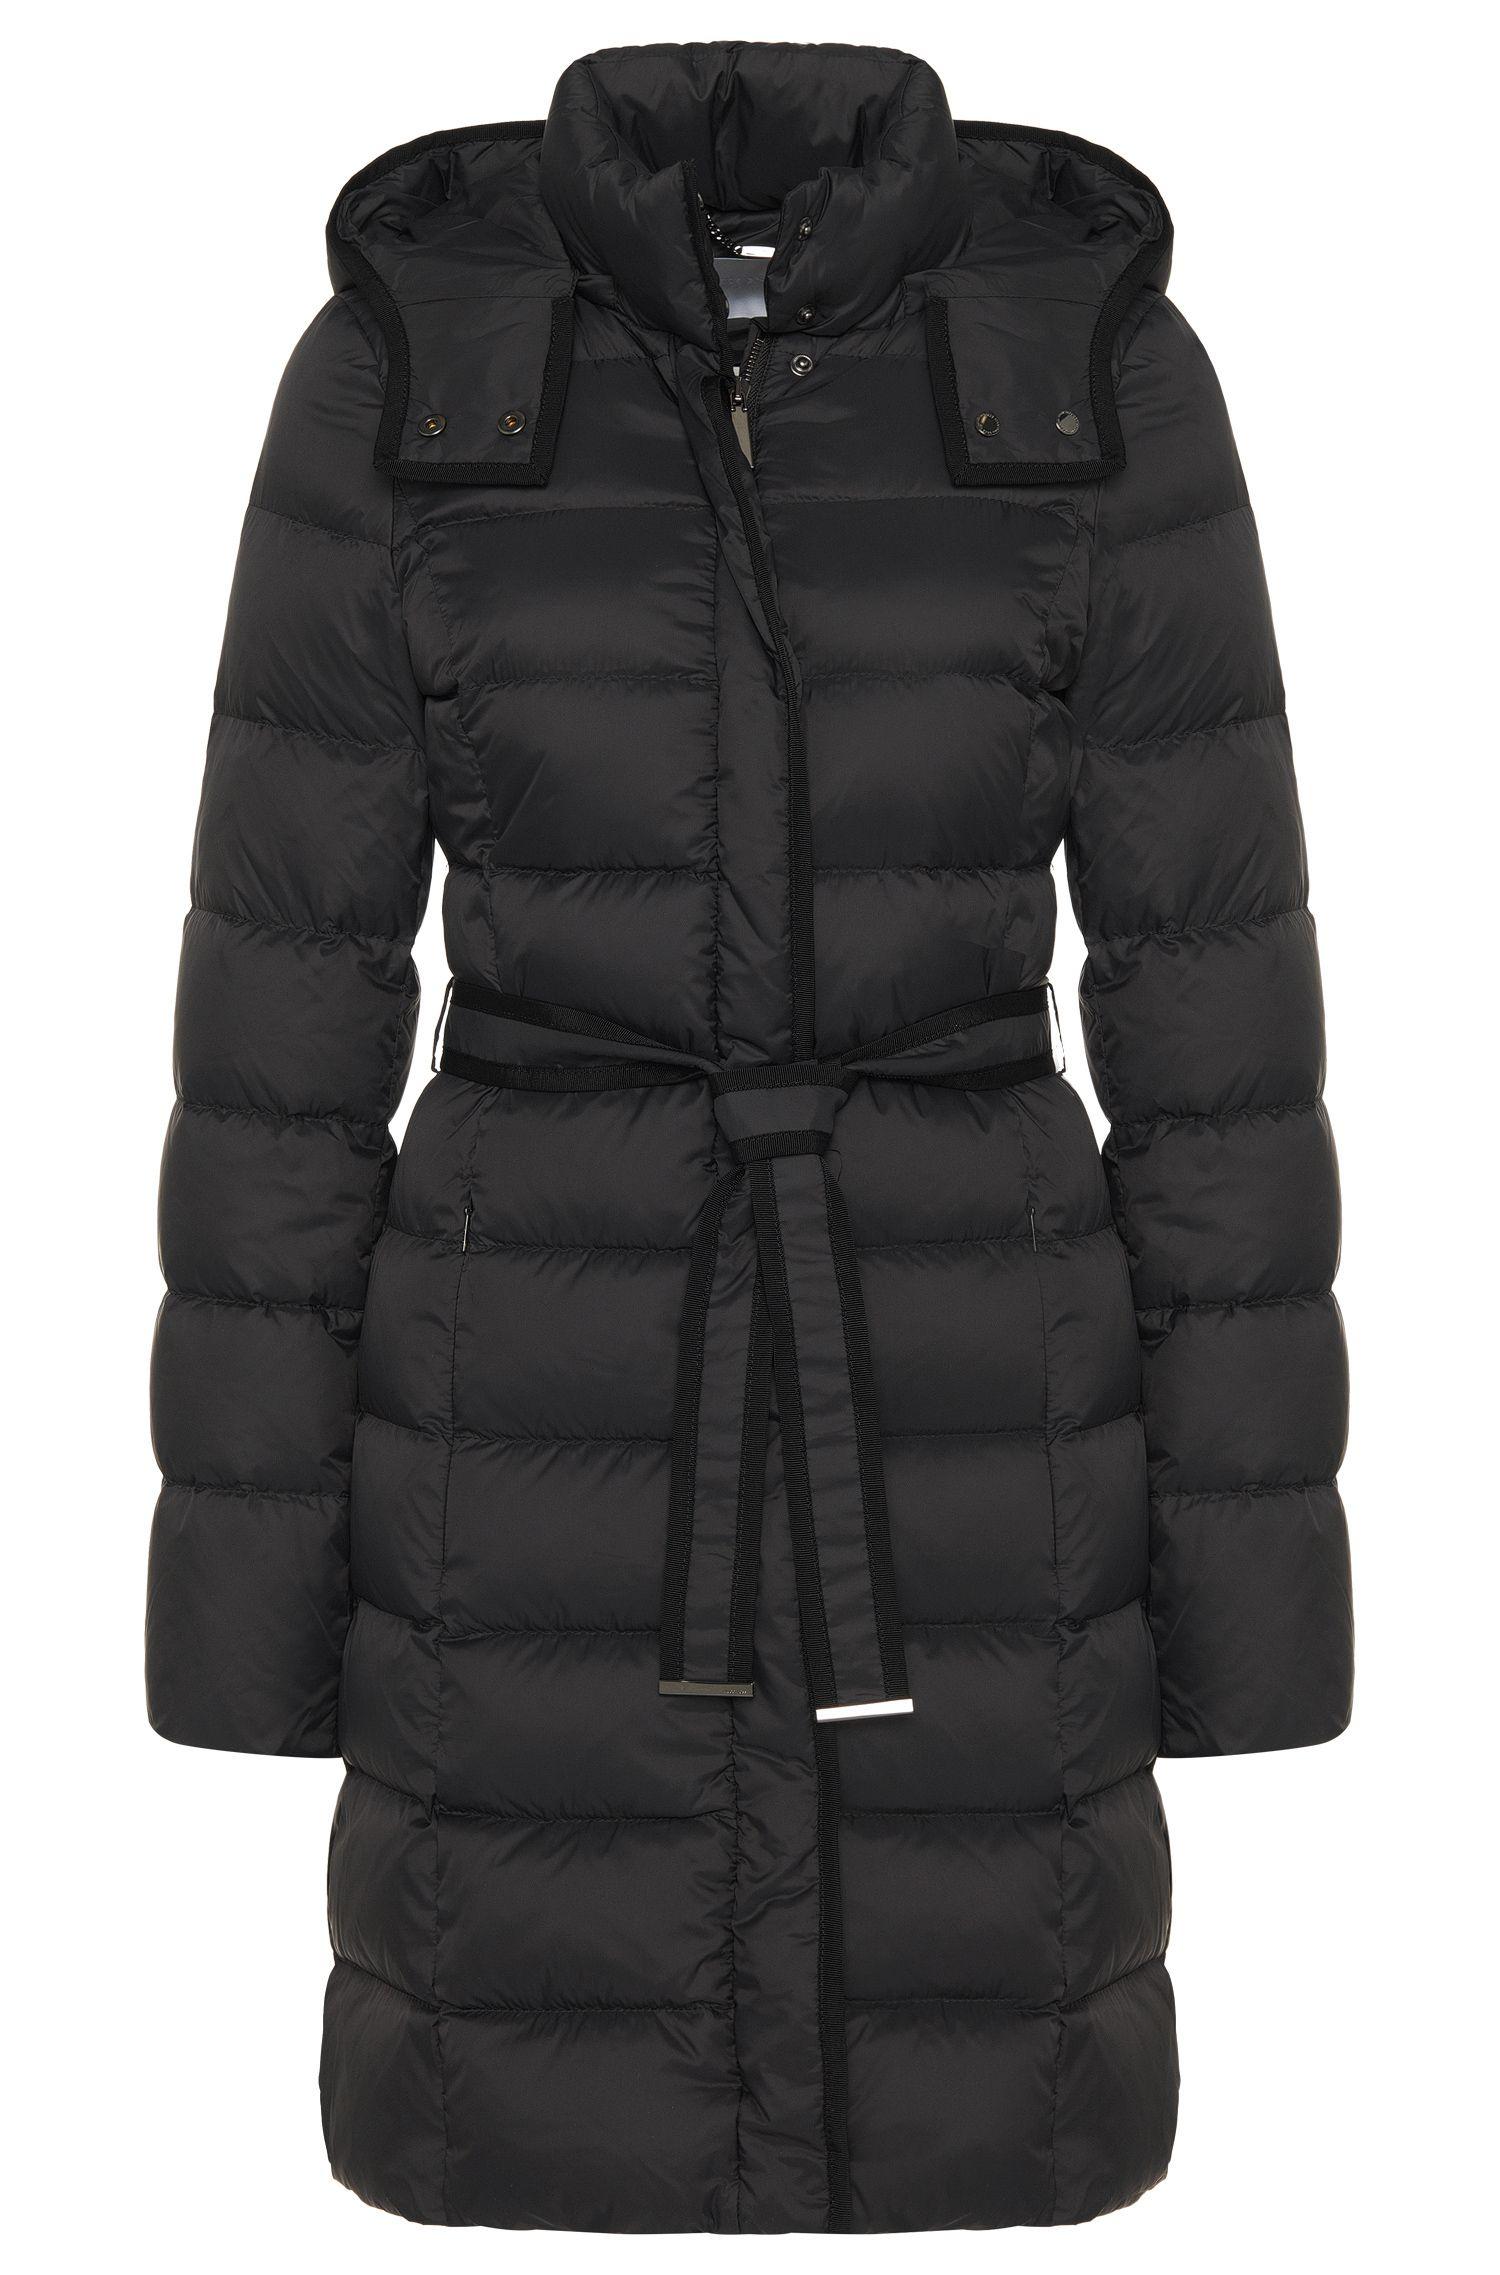 Abrigo guateado con relleno de plumón y cinturón de anudar: 'Pavina'